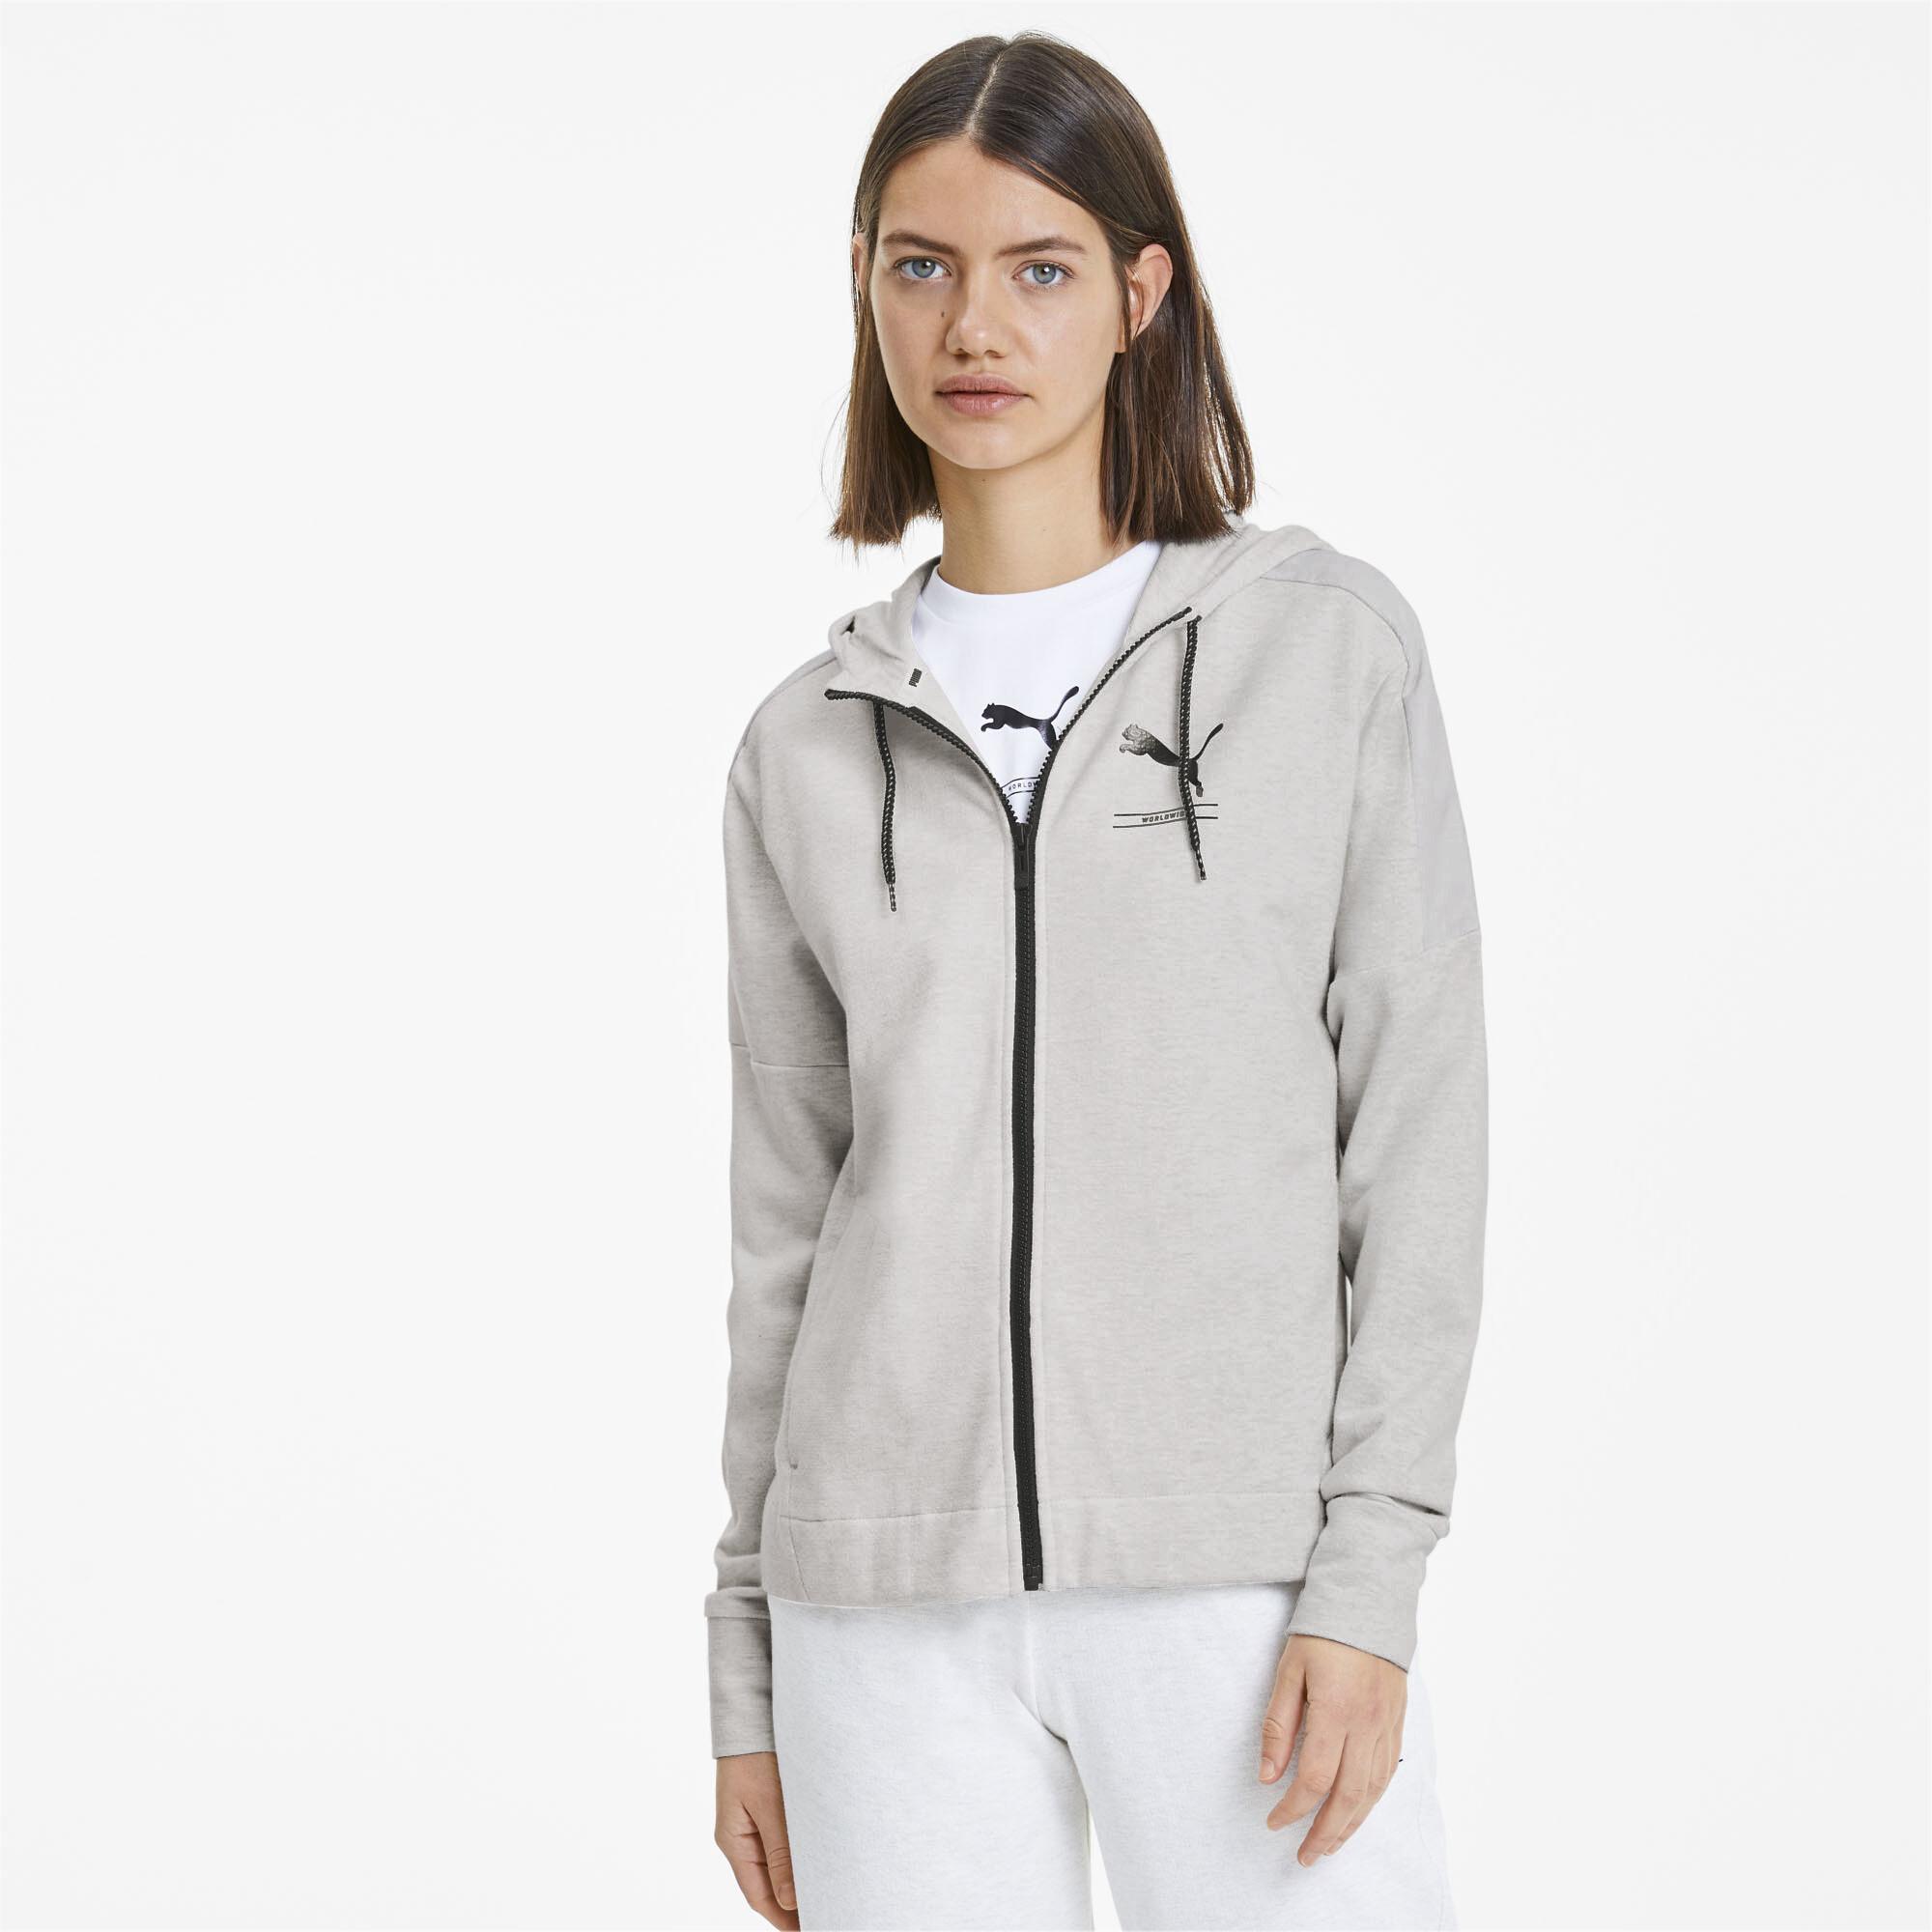 PUMA-NU-TILITY-Women-039-s-Full-Zip-Hoodie-Women-Sweat-Basics miniatuur 15